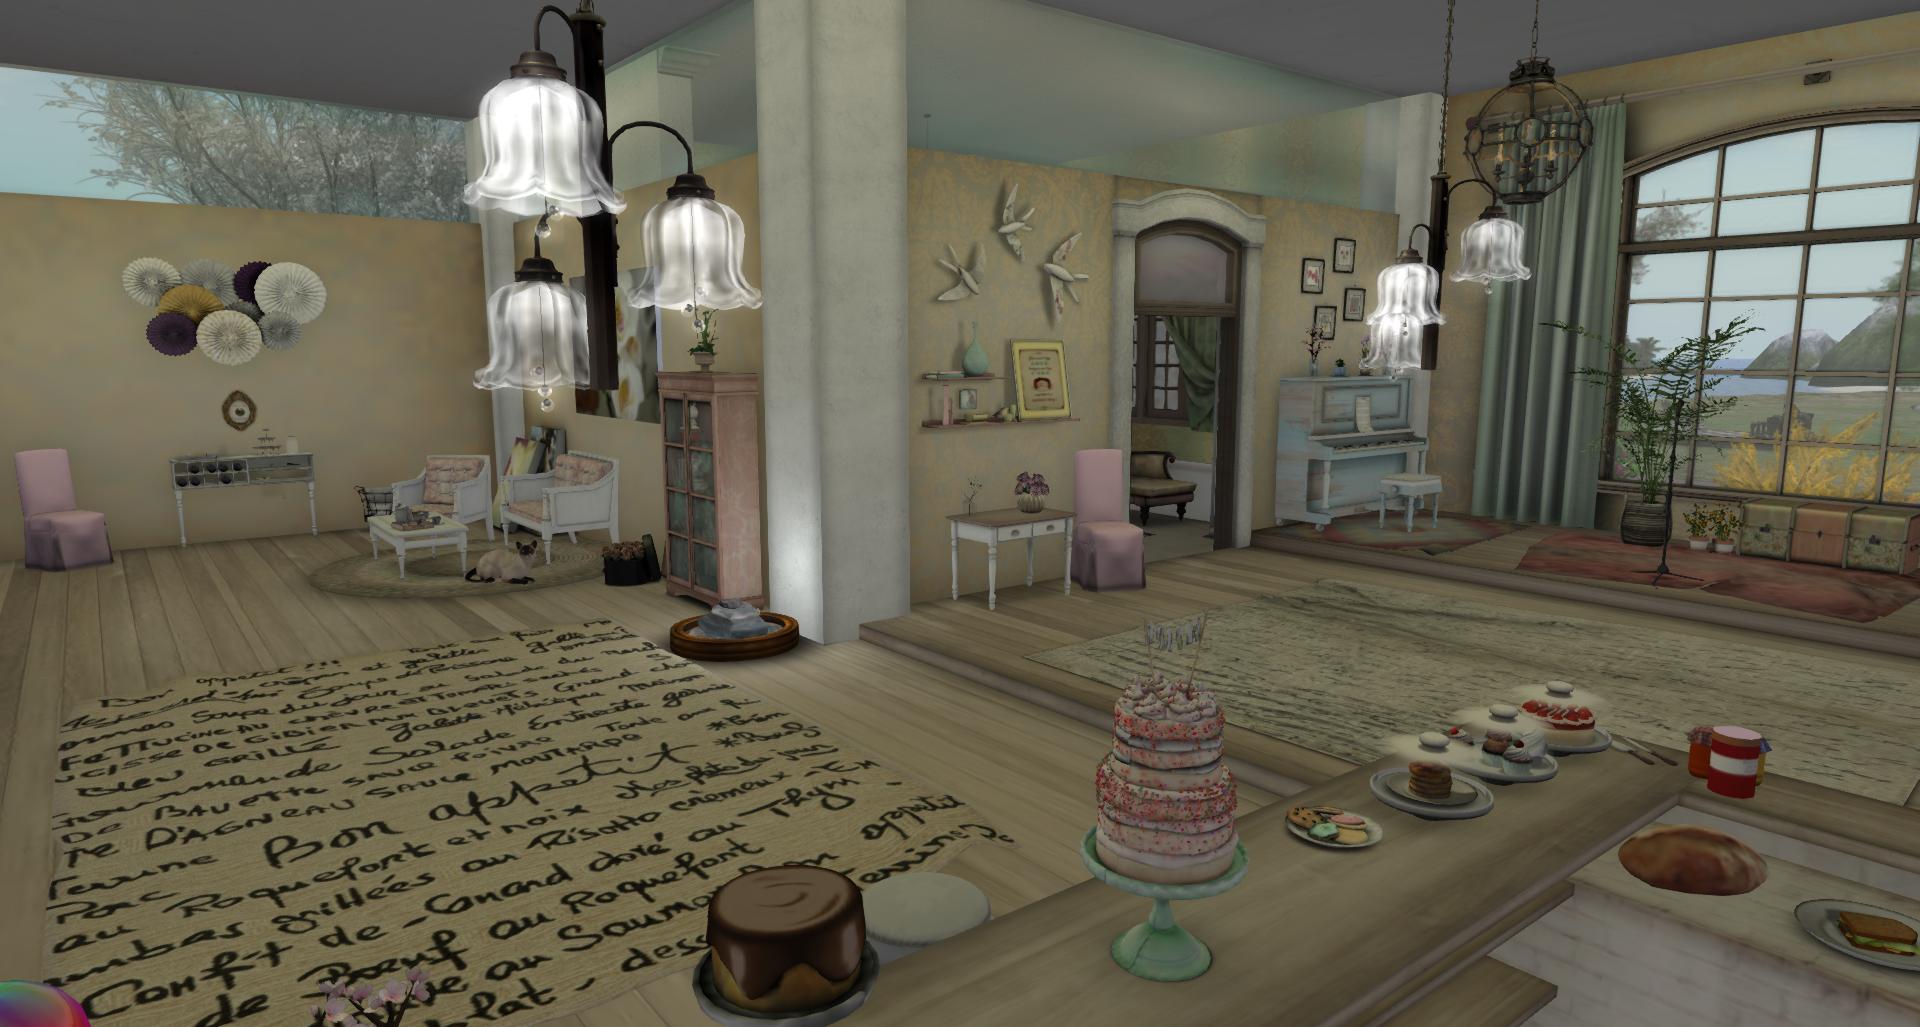 Cafe+Gateau+Interior.png